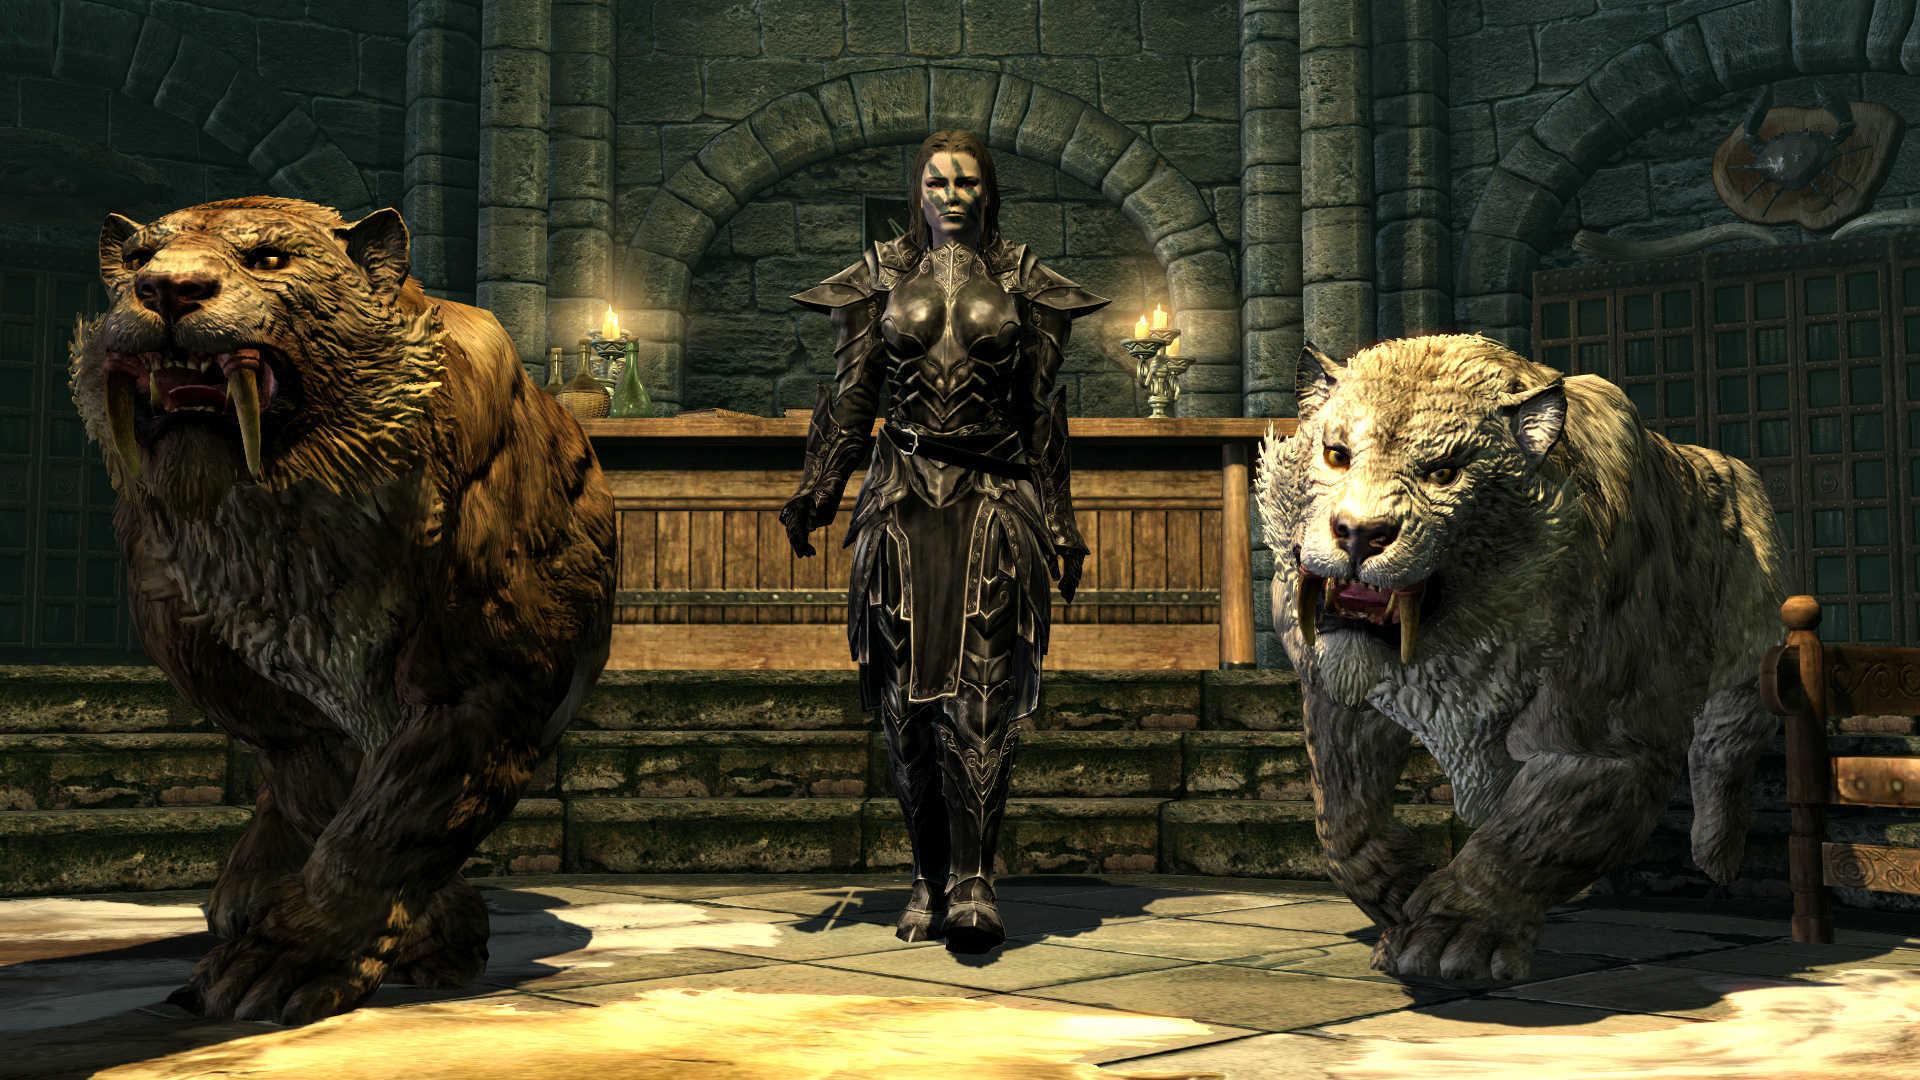 Wallpaper The Elder Scrolls Heroes Of Skyrim 4k Games Legends